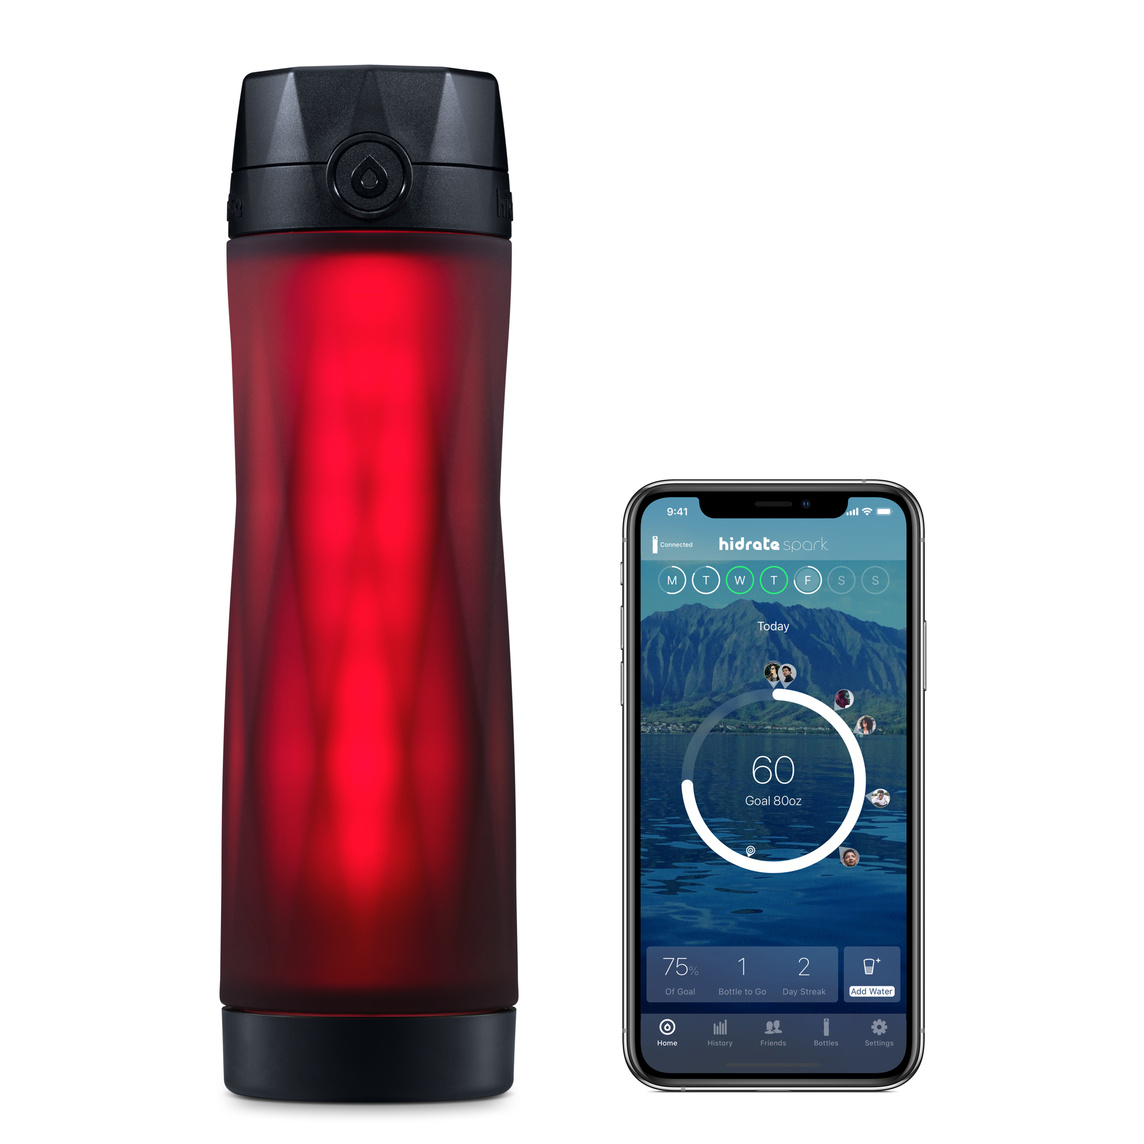 Botella de agua inteligente Hidrate Spark 3 - Negro - Apple (ES)